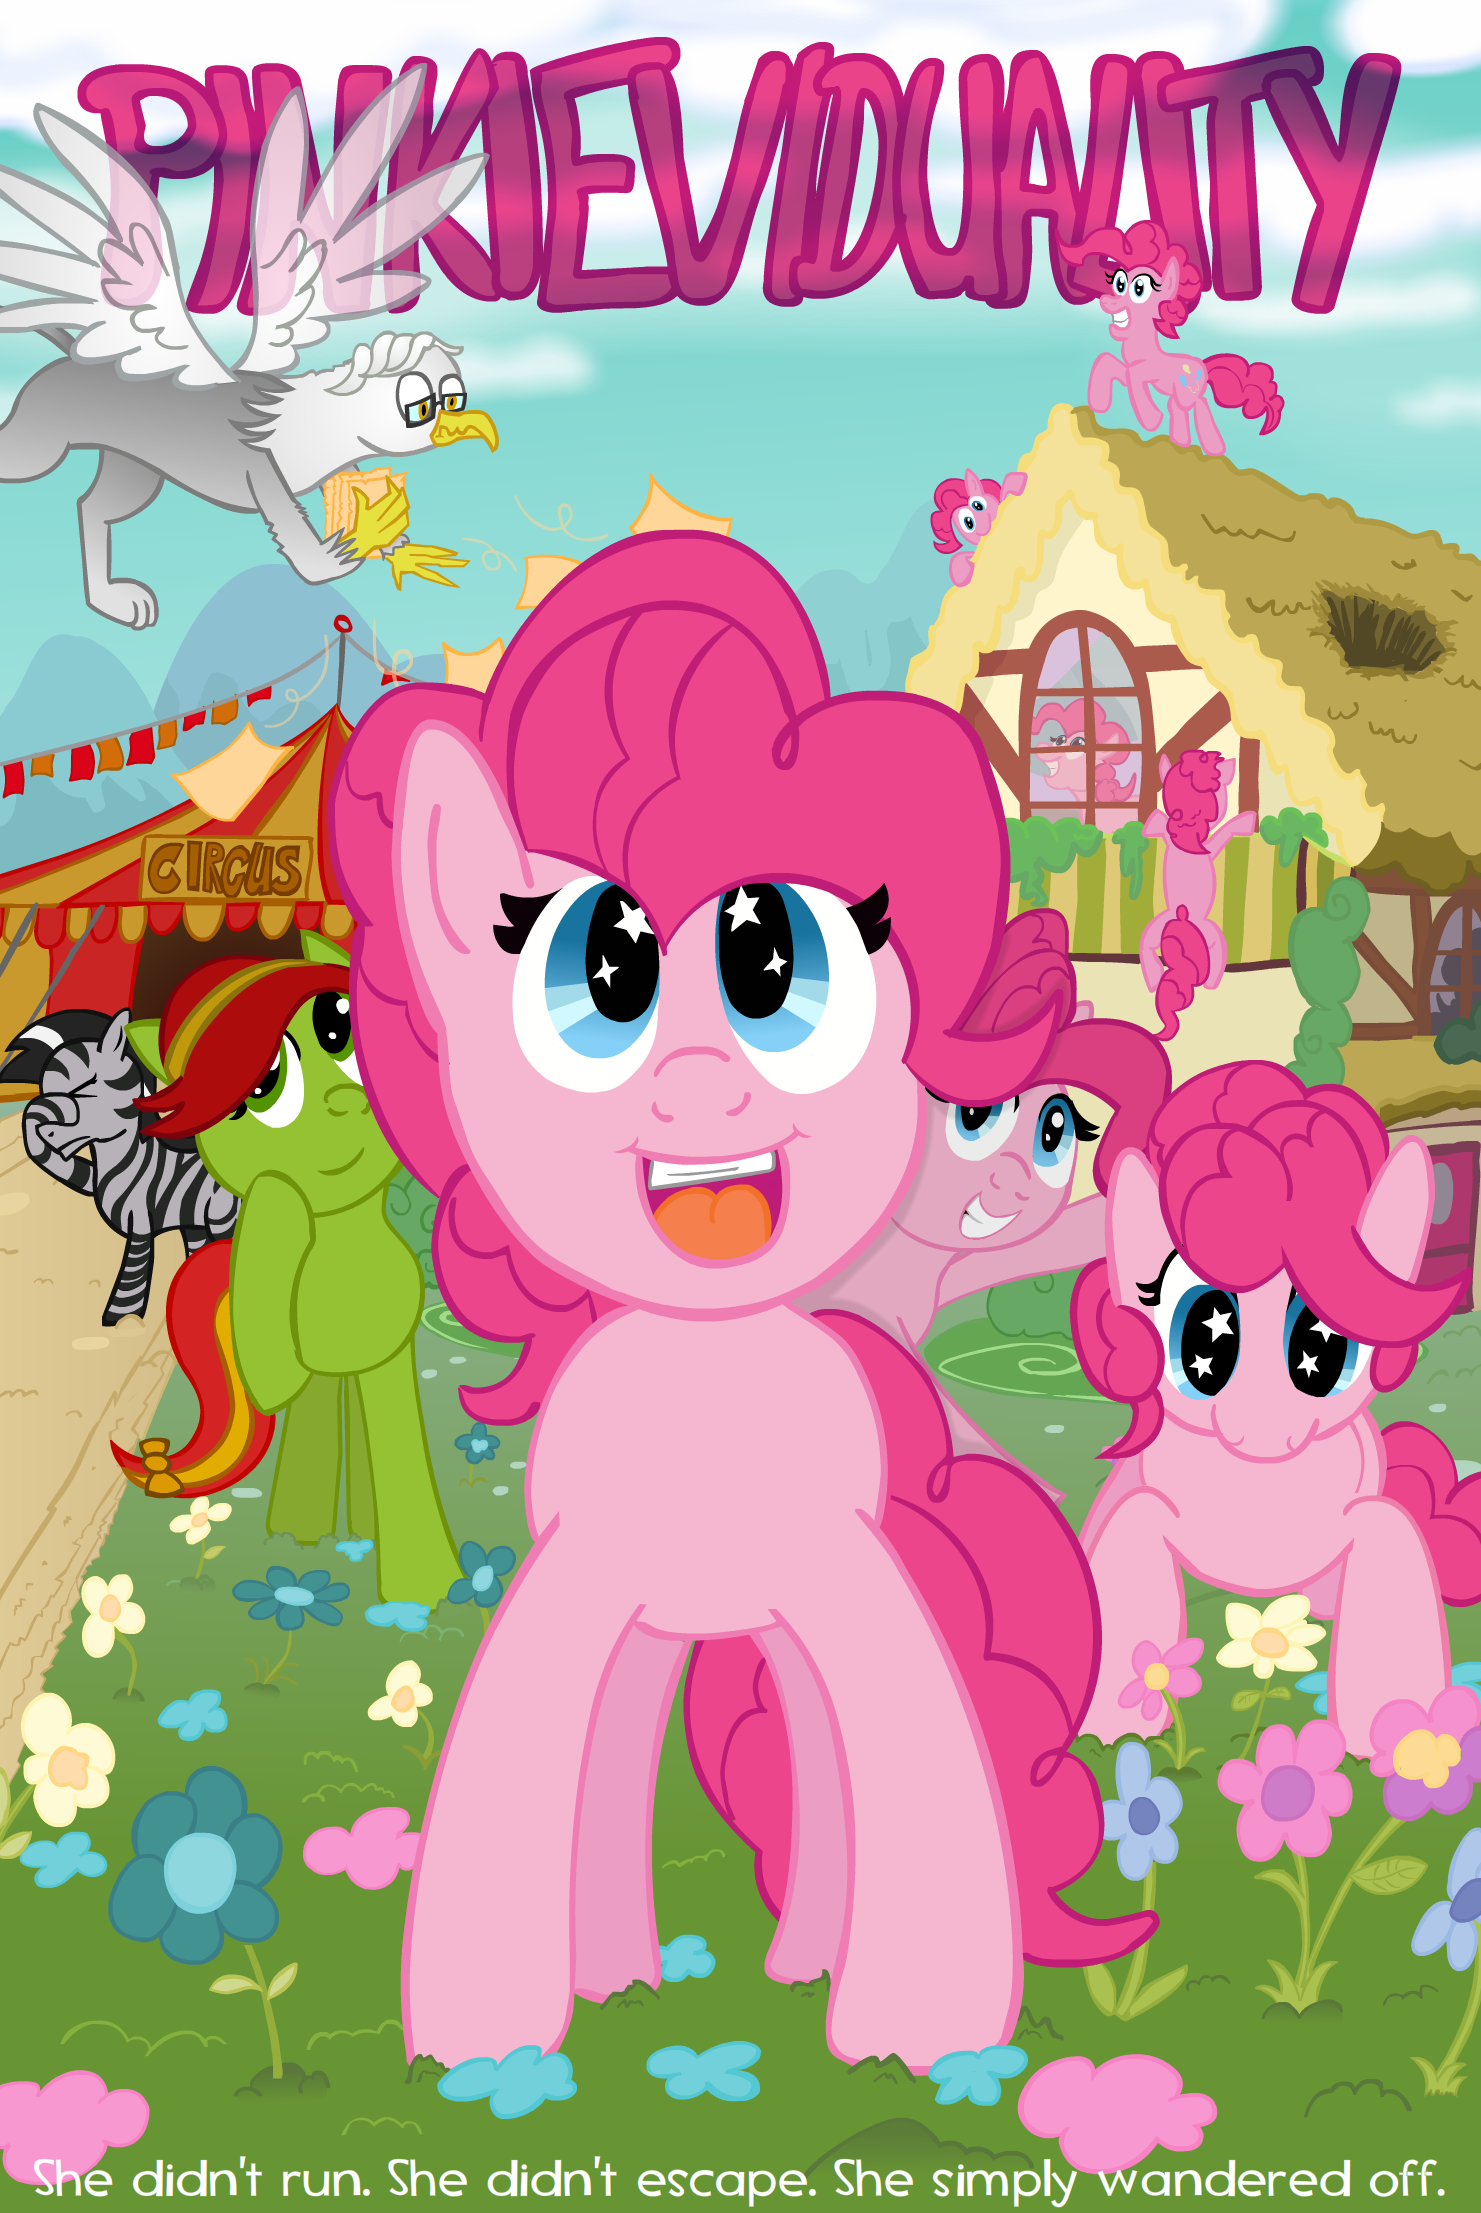 Pinkieviduality (Cover-image) by UltraTheHedgetoaster